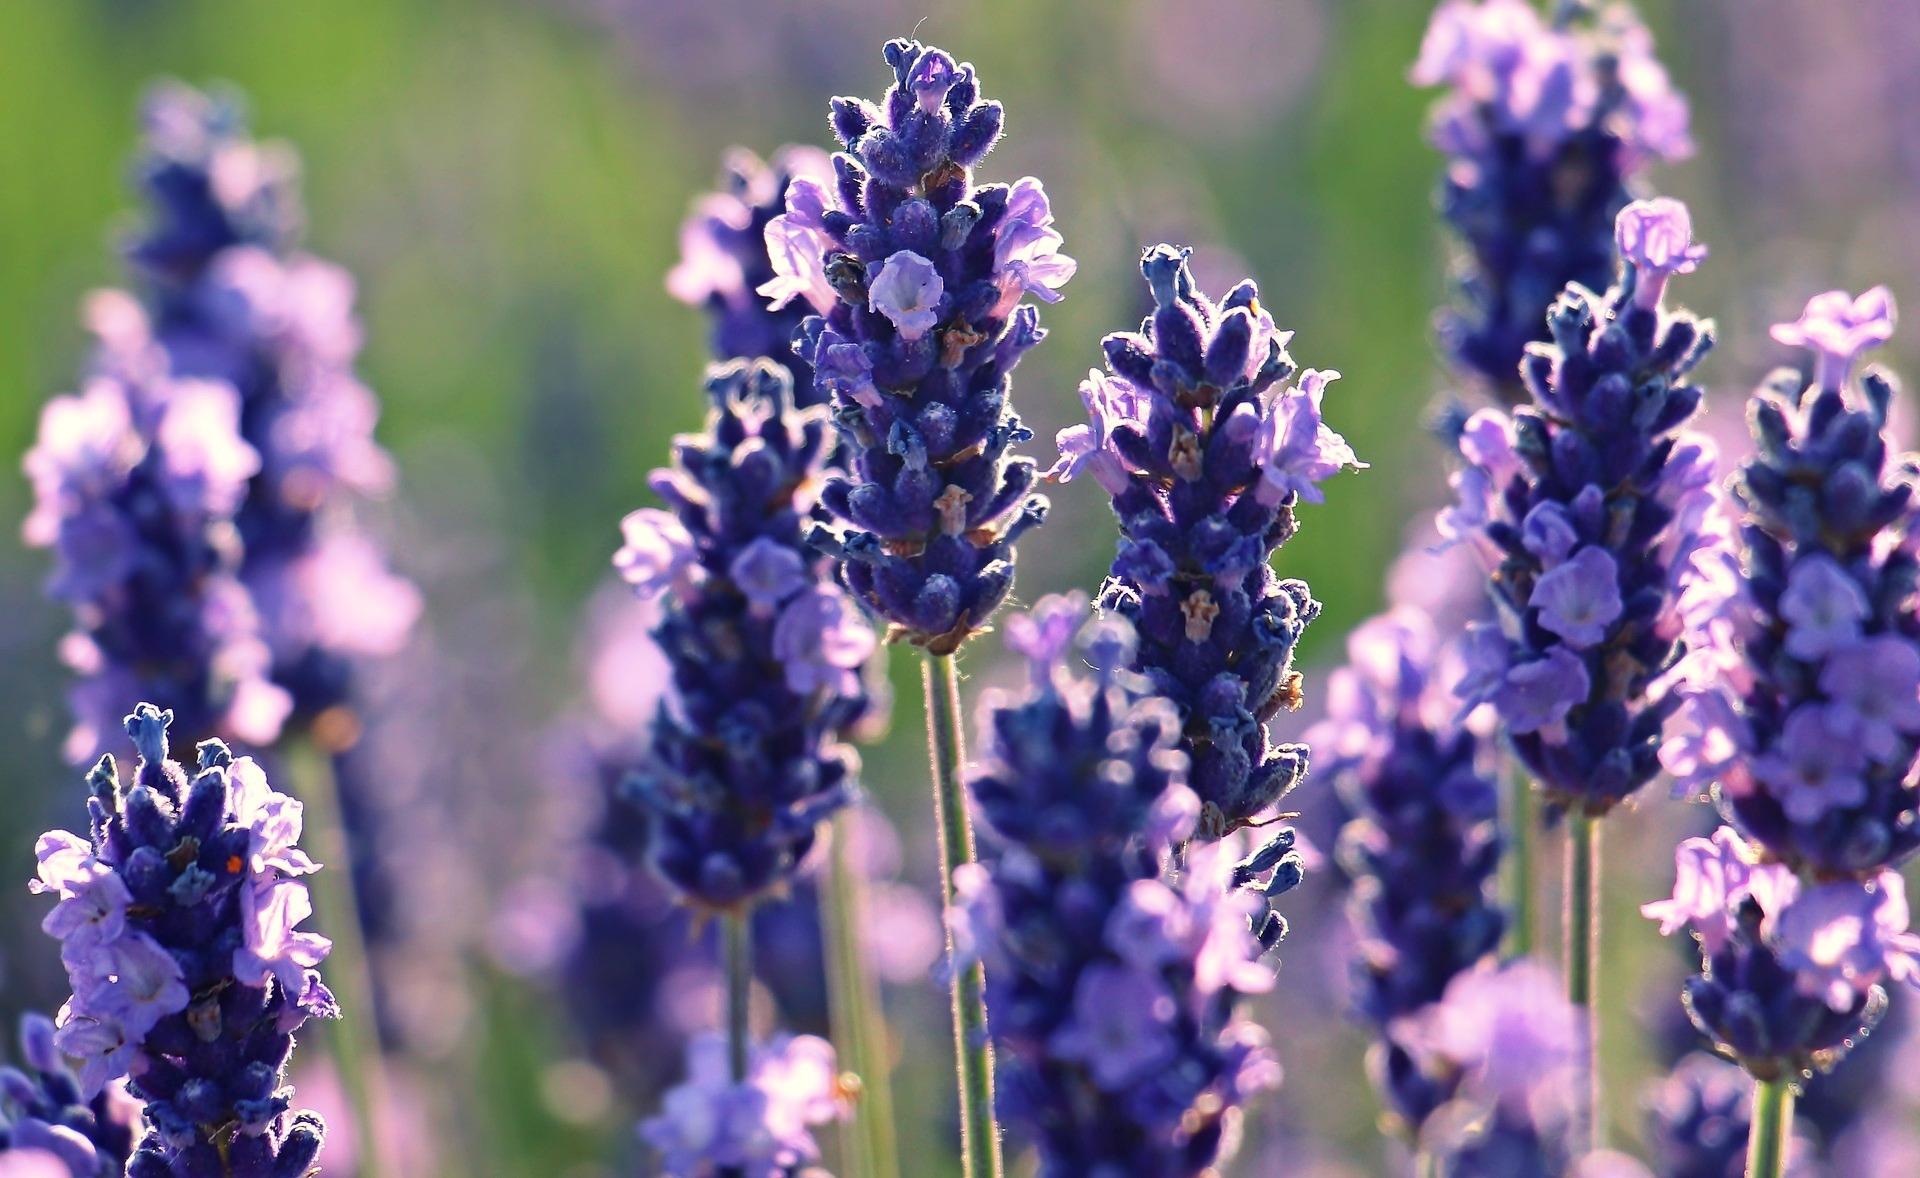 lavender-2426376_1920.jpg